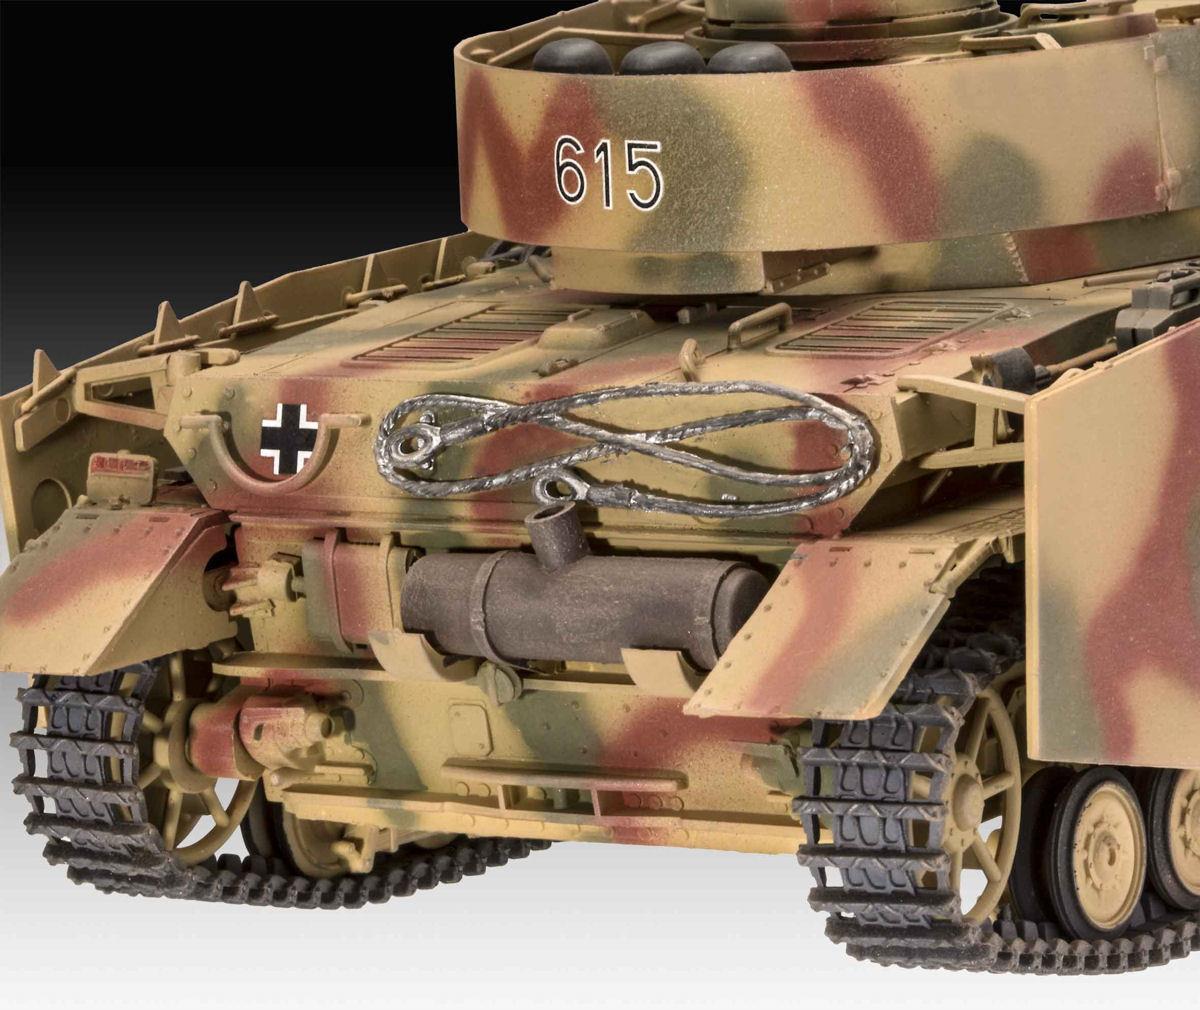 Revell 03333 Pz.Kpfw.IV Ausf.H Panzer IV - grootste modelbouwwinkel van Europa